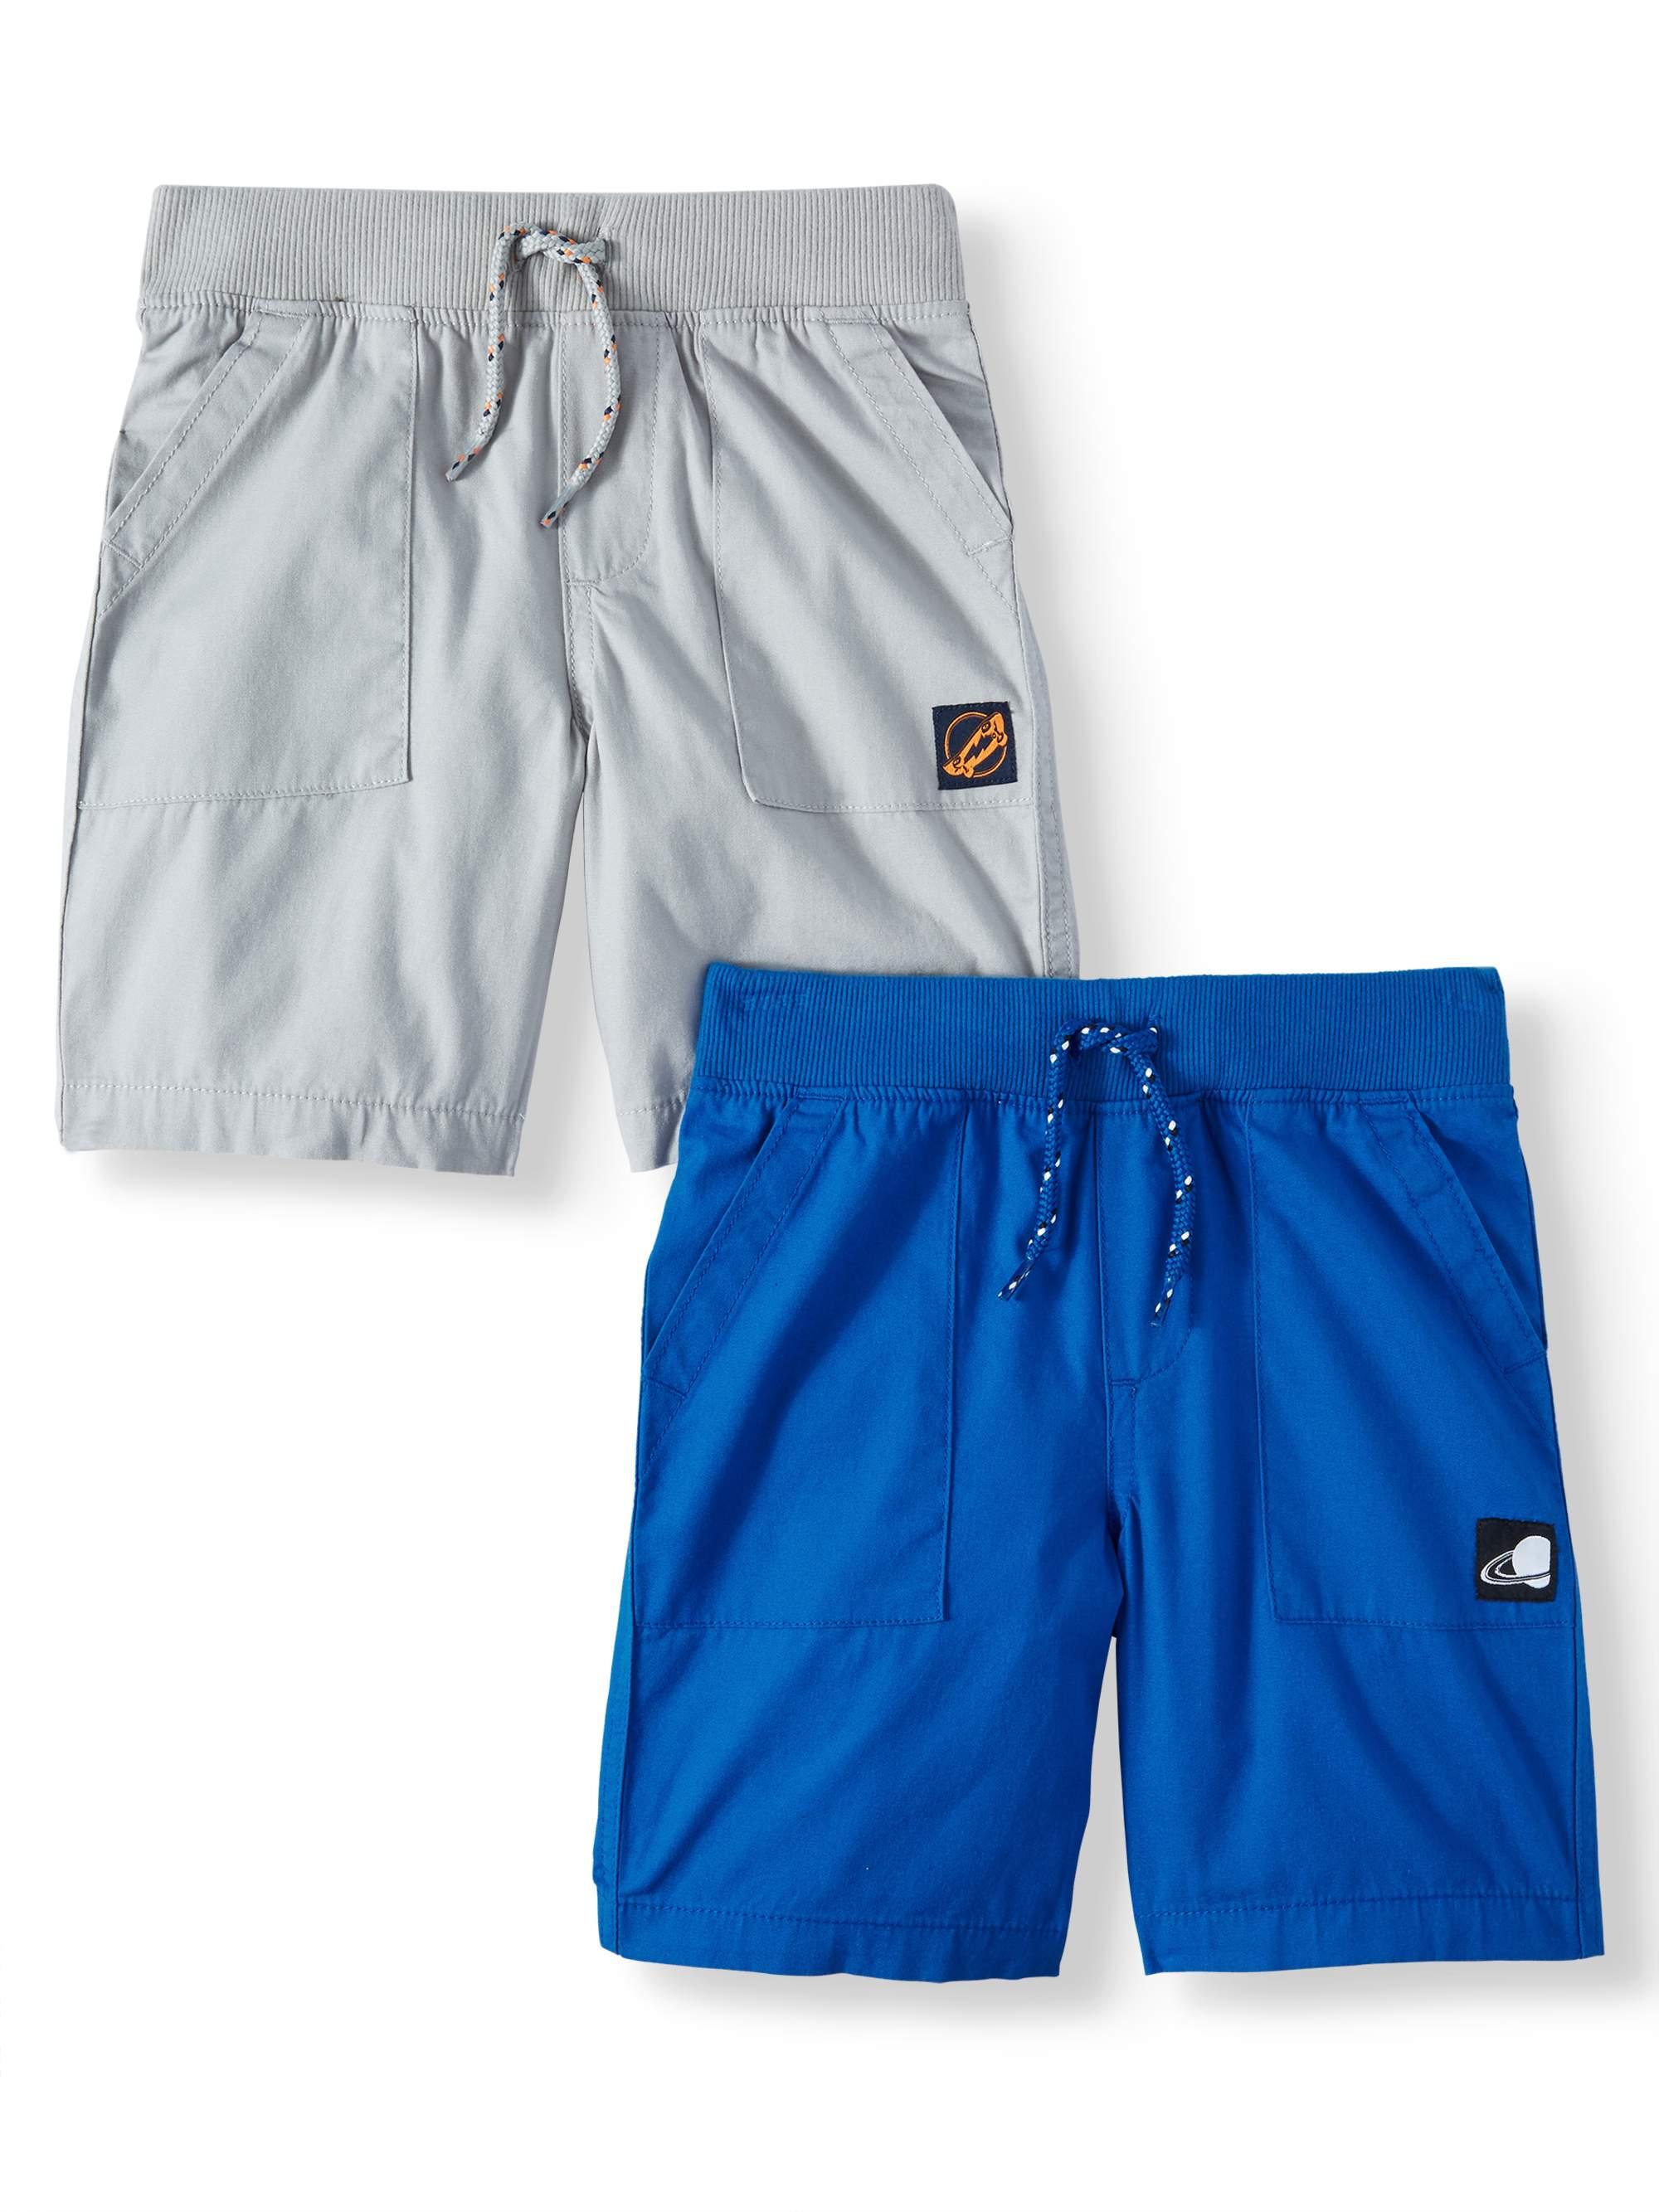 Essential Pull-On Utility Shorts, 2-Piece Multi-Pack Set (Little Boys & Big Boys)